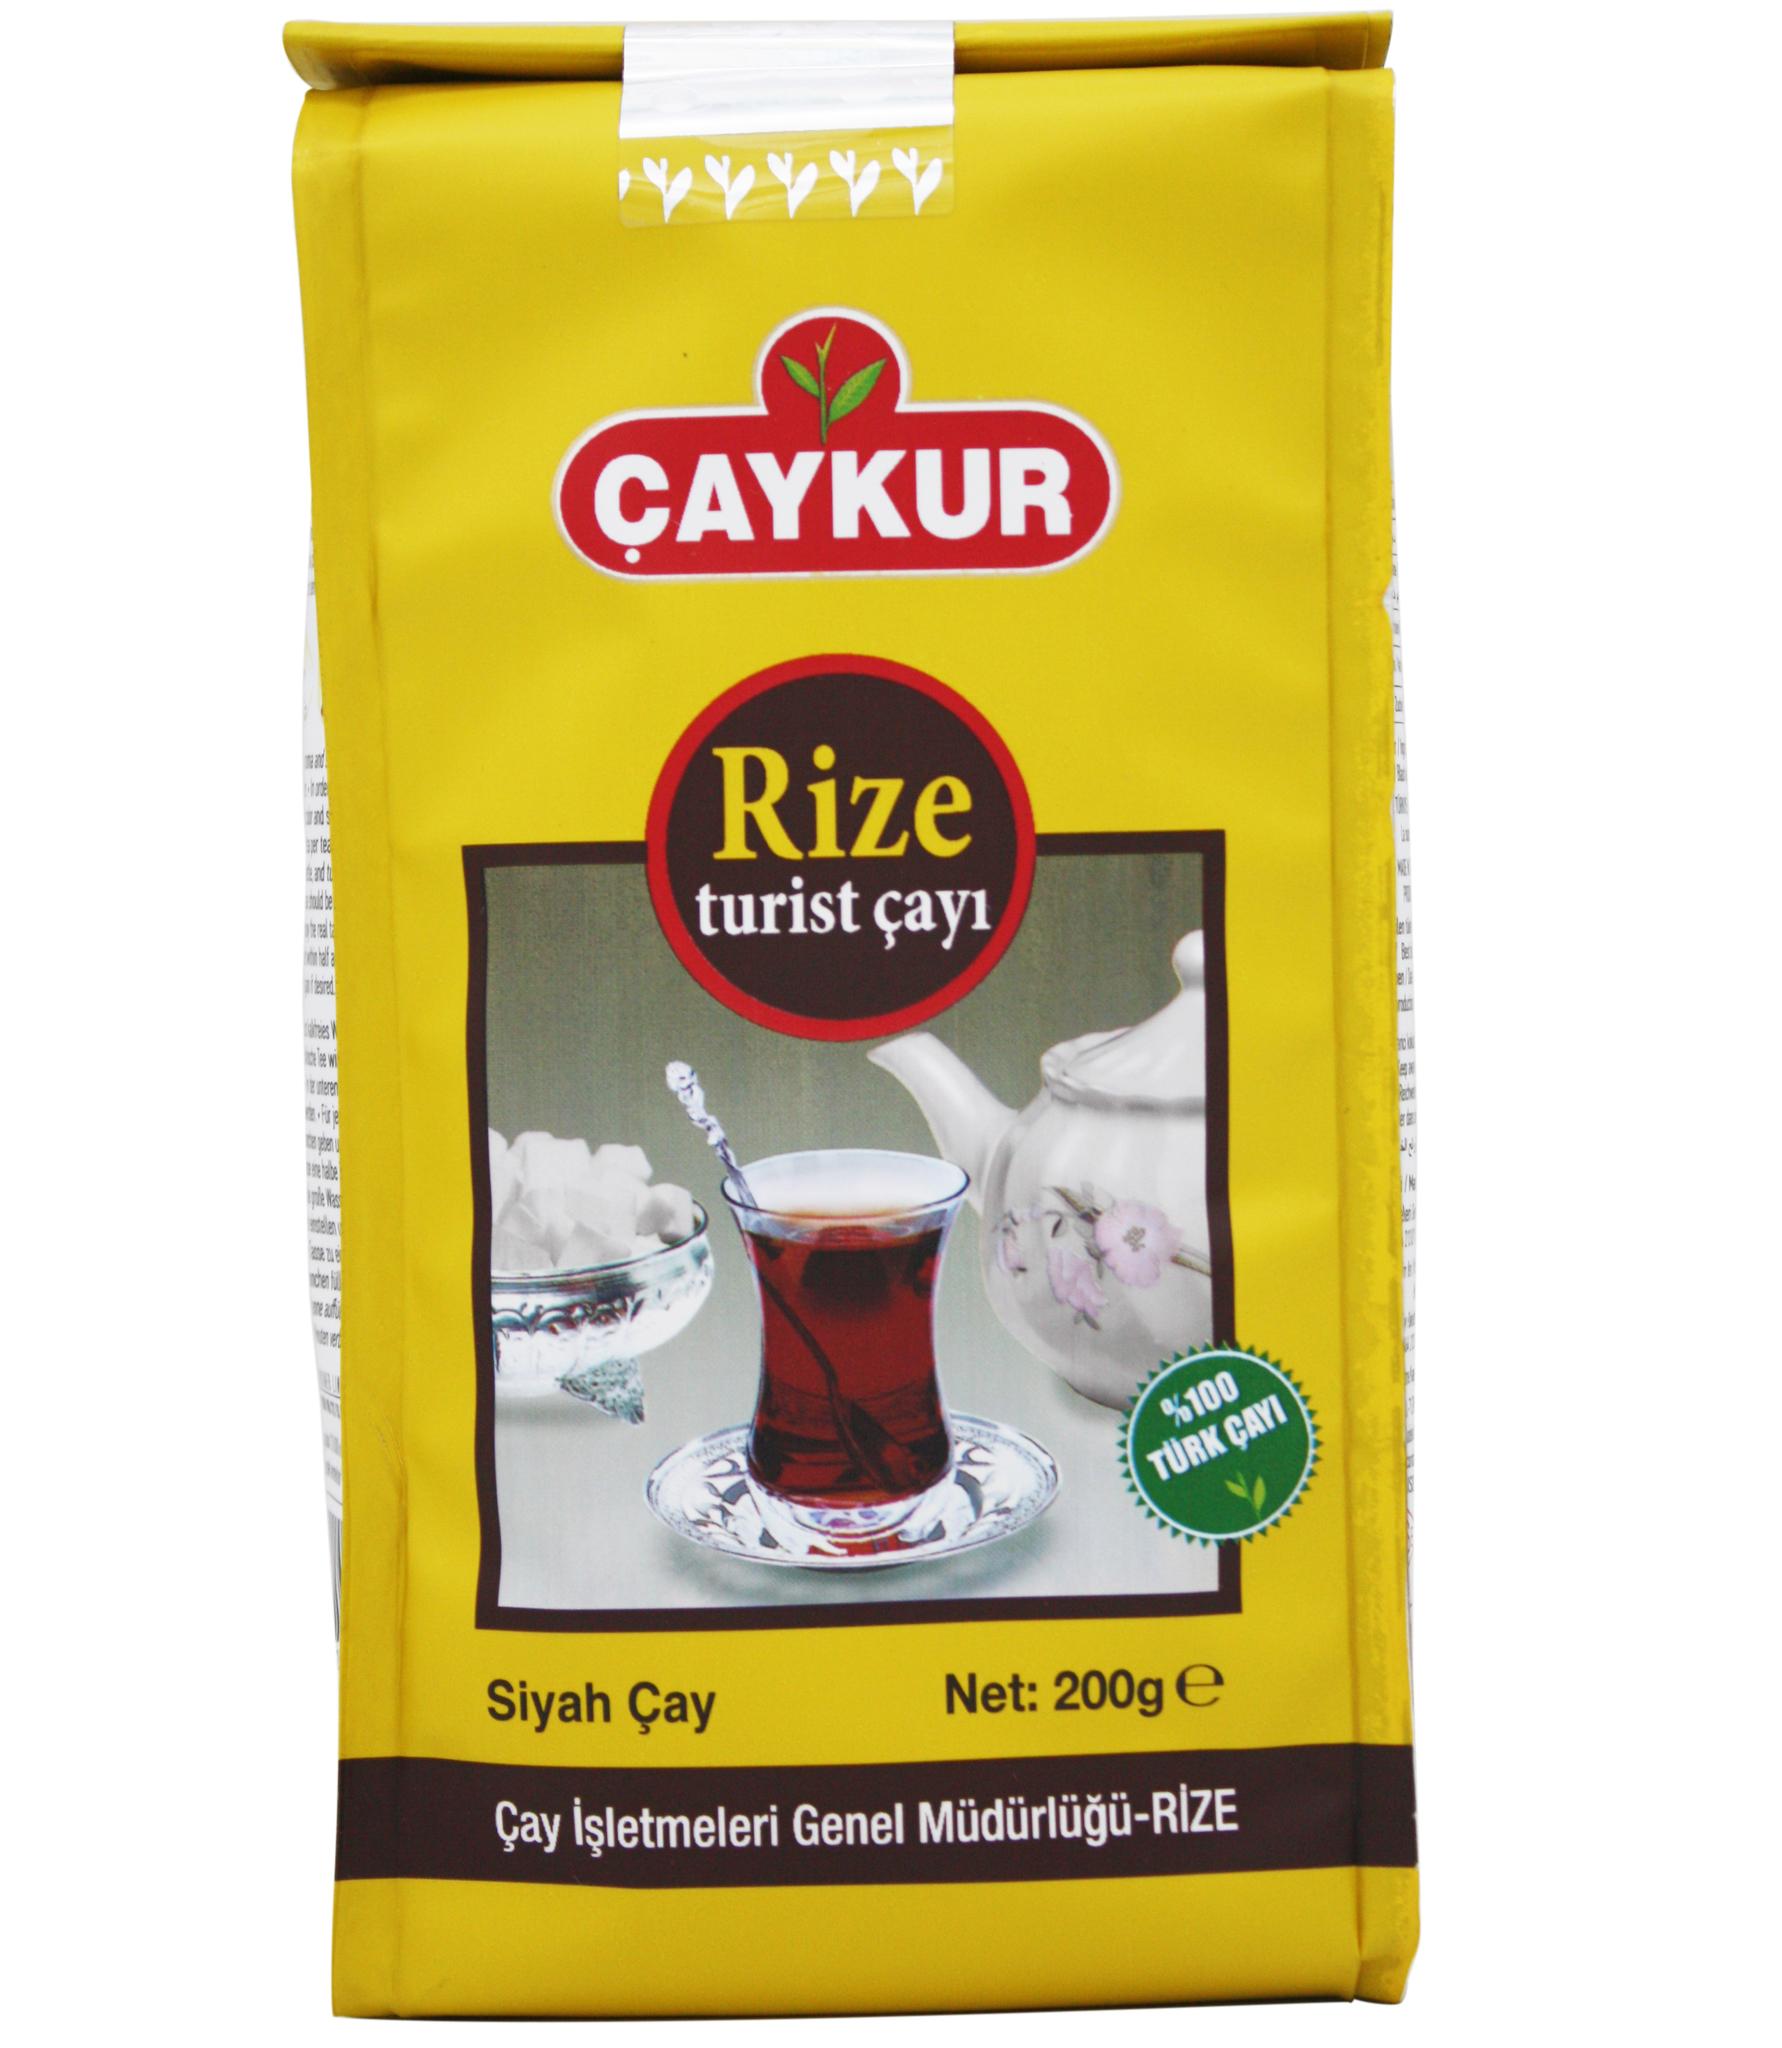 Çaykur Турецкий черный чай Rize Turist, Çaykur, 200 г import_files_17_174bf815df9711e9a9b6484d7ecee297_06646421ef3211e9a9ba484d7ecee297.jpg